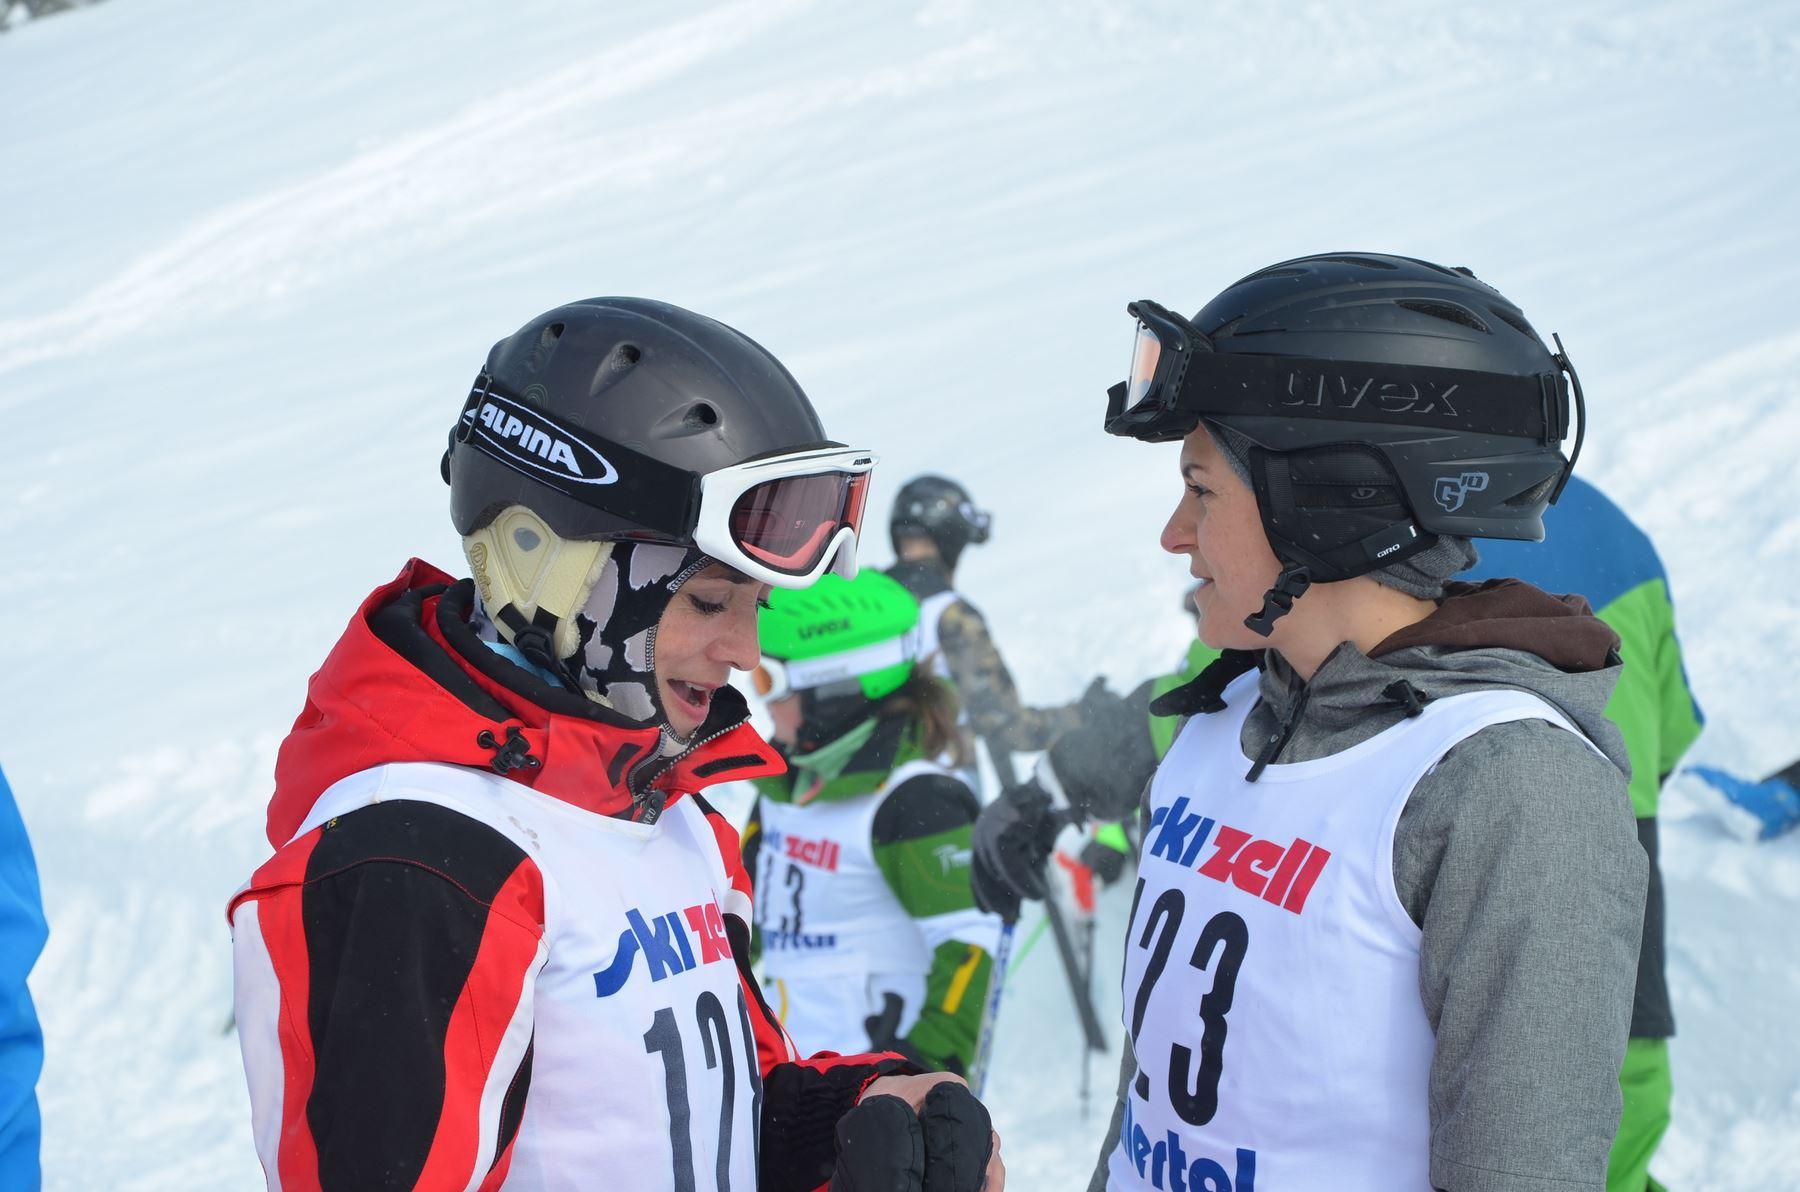 2015-03-22 BV Zillertal Skirennen 073.JPG